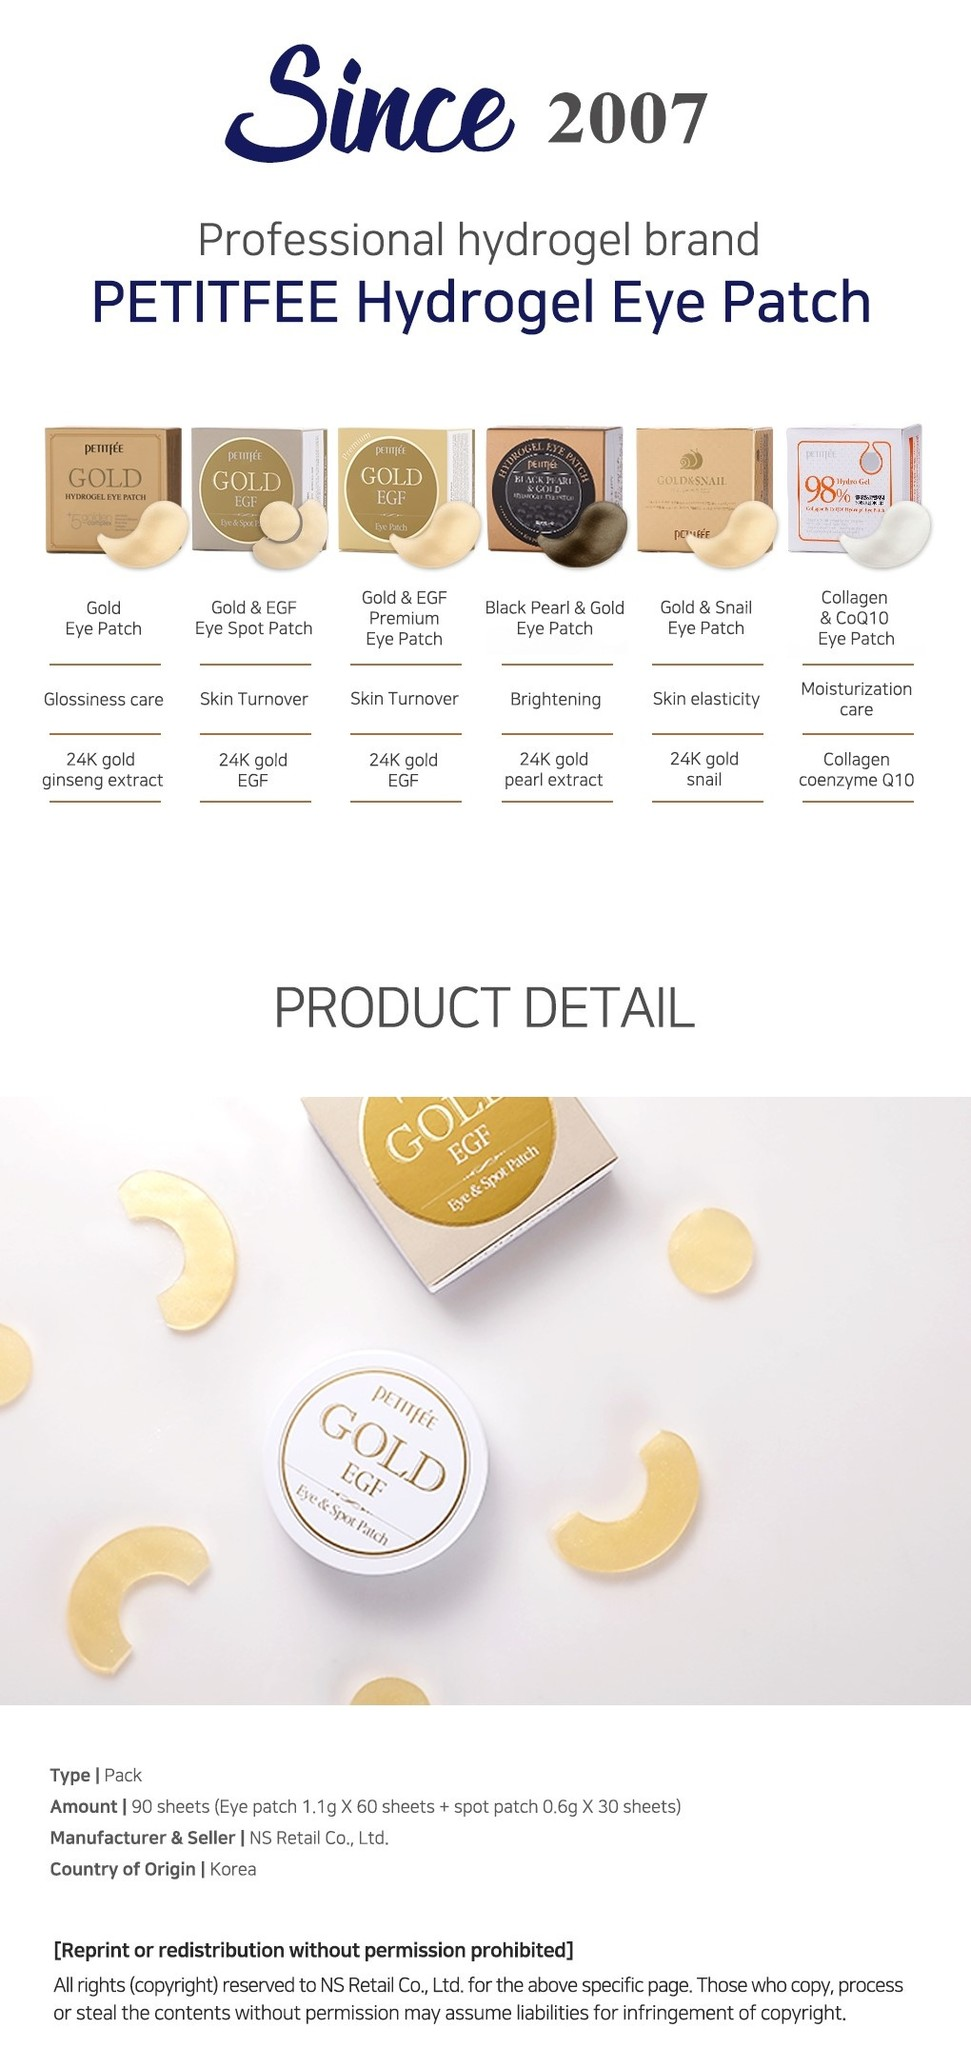 Gold & EGF Eye & Spot Patch-9